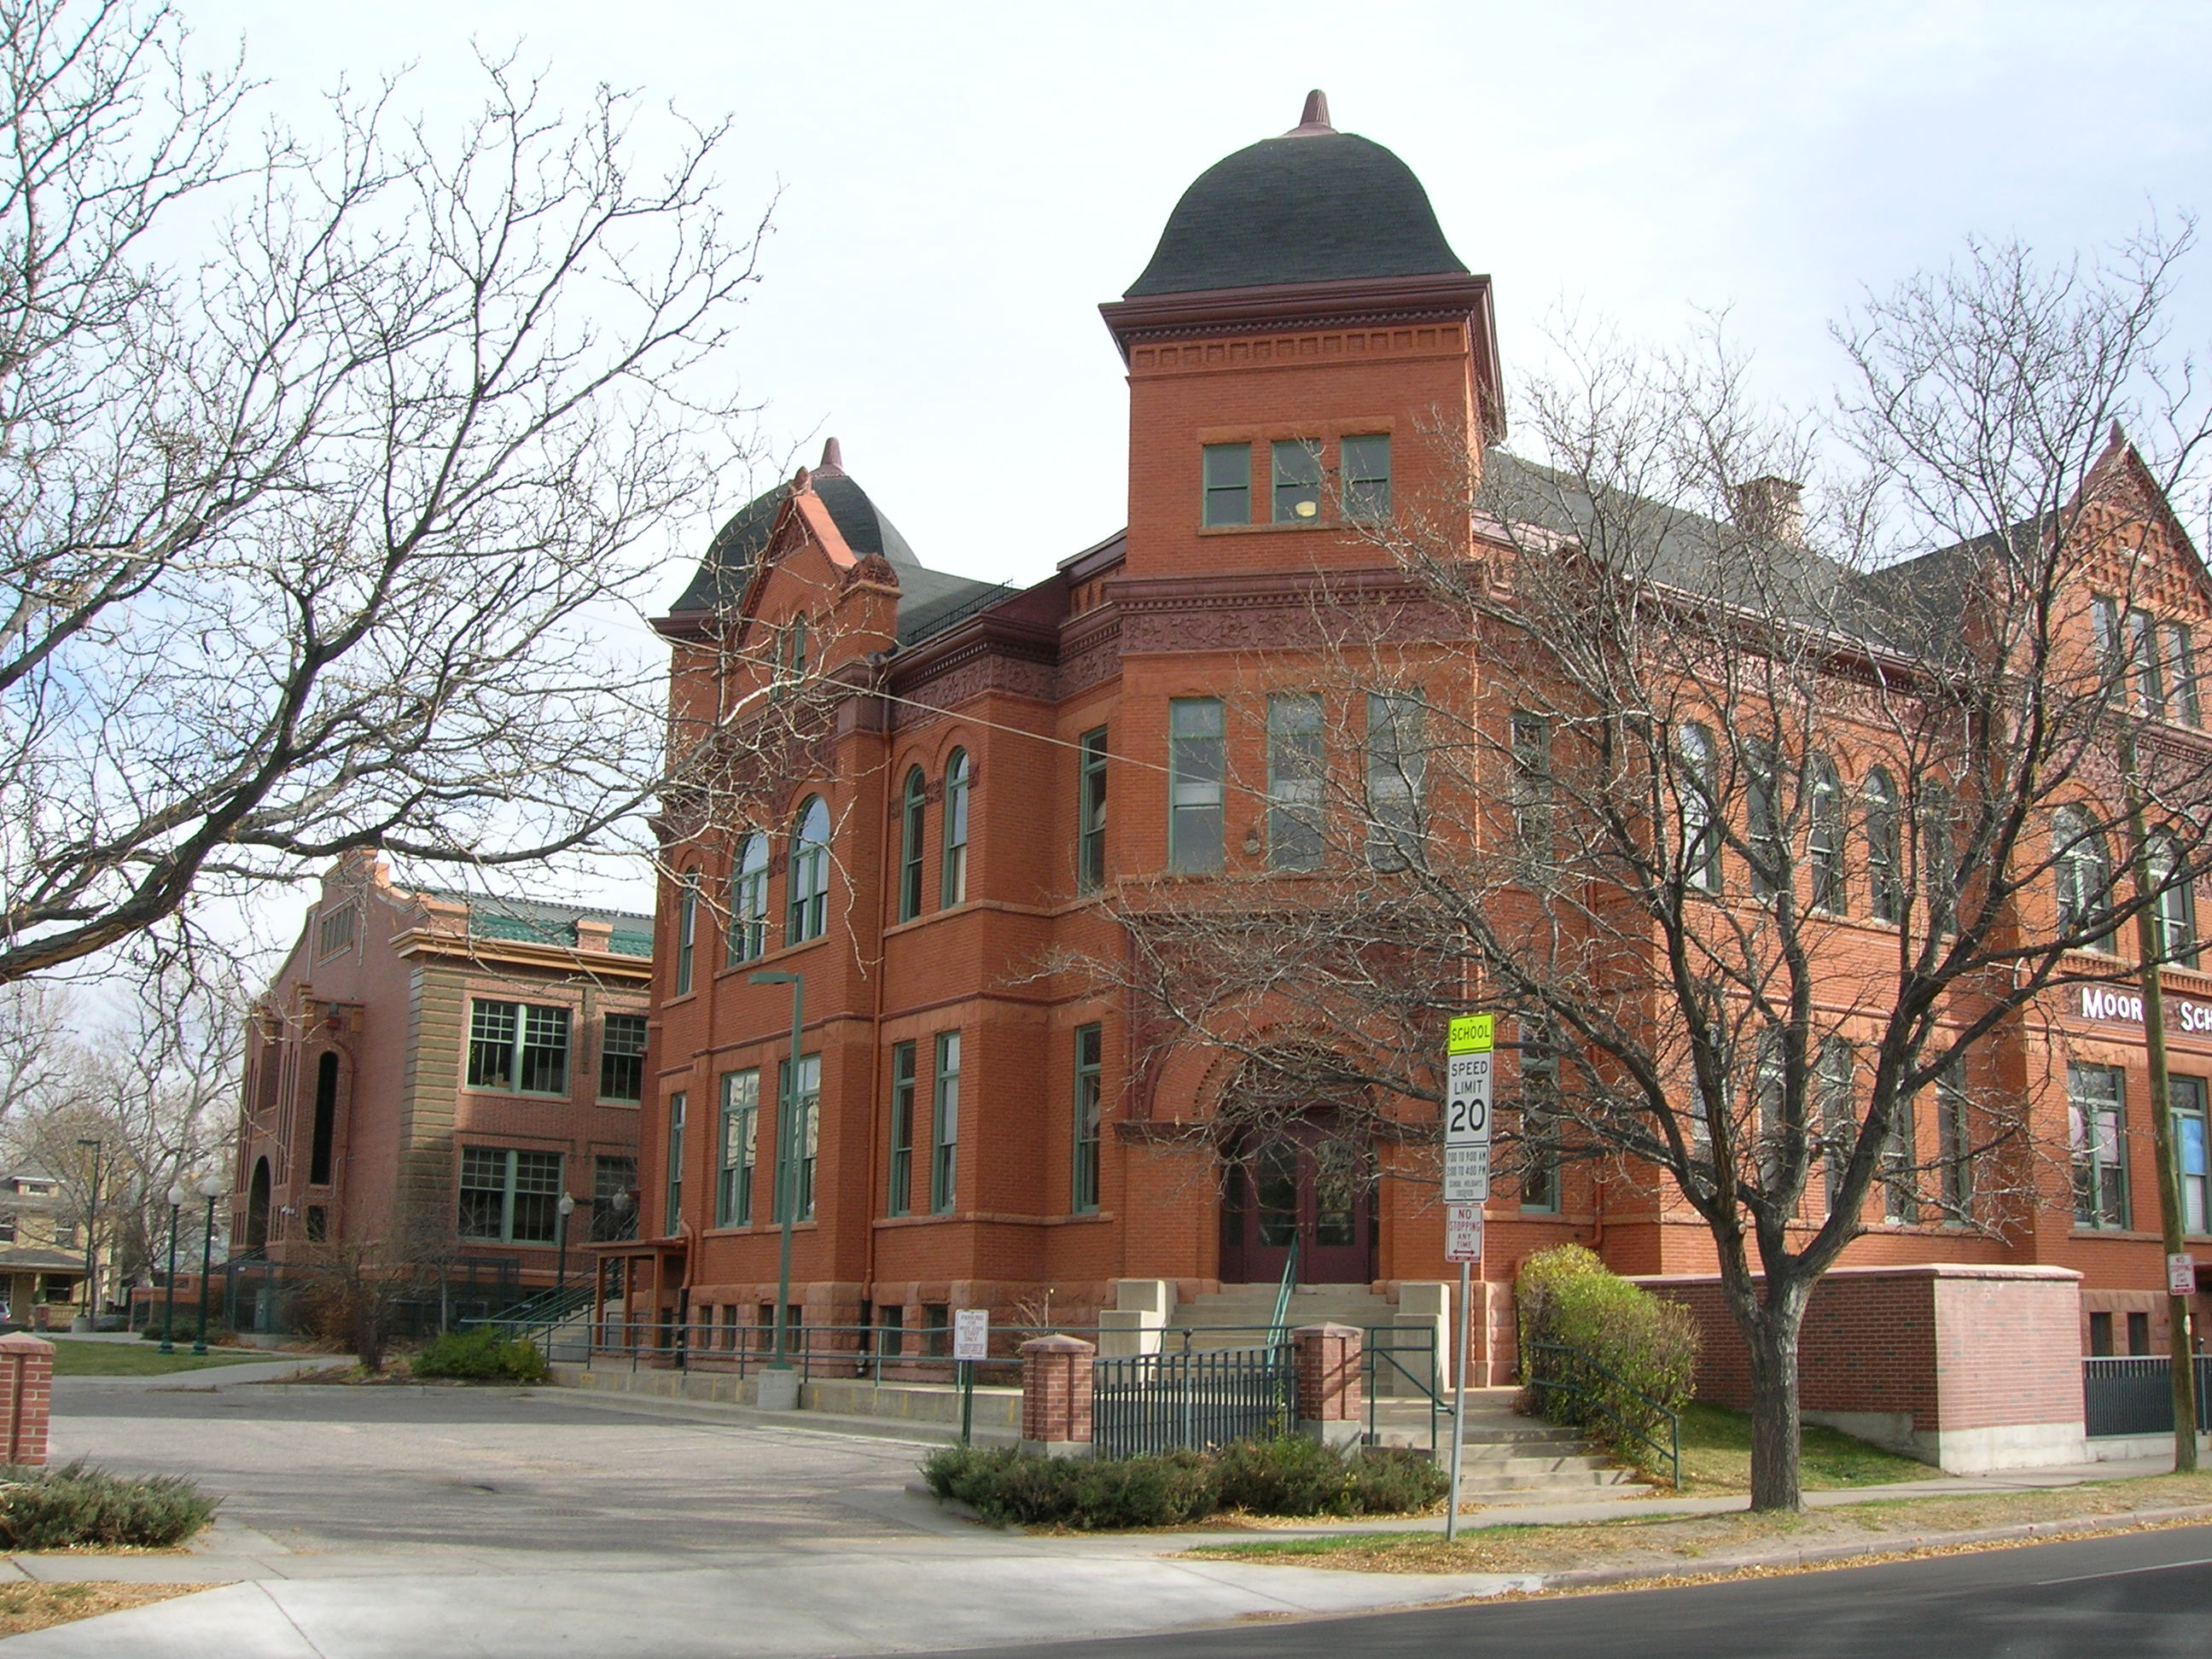 Dora Moore Elementary